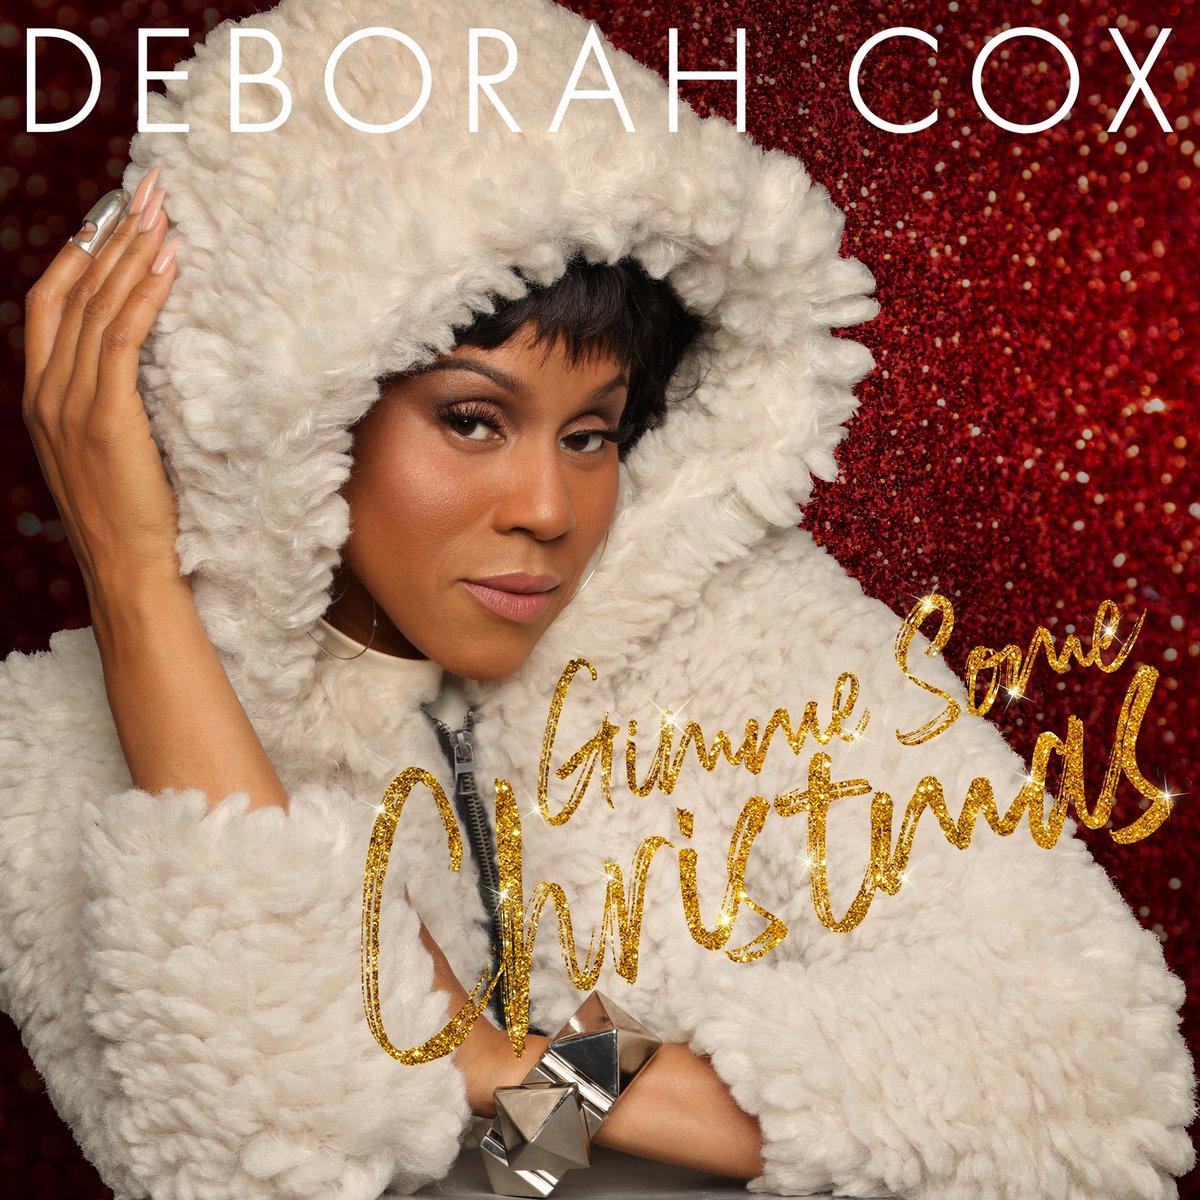 Get festive!! Did you hear GimmeGimmeGimmeSomeChristmas🎄